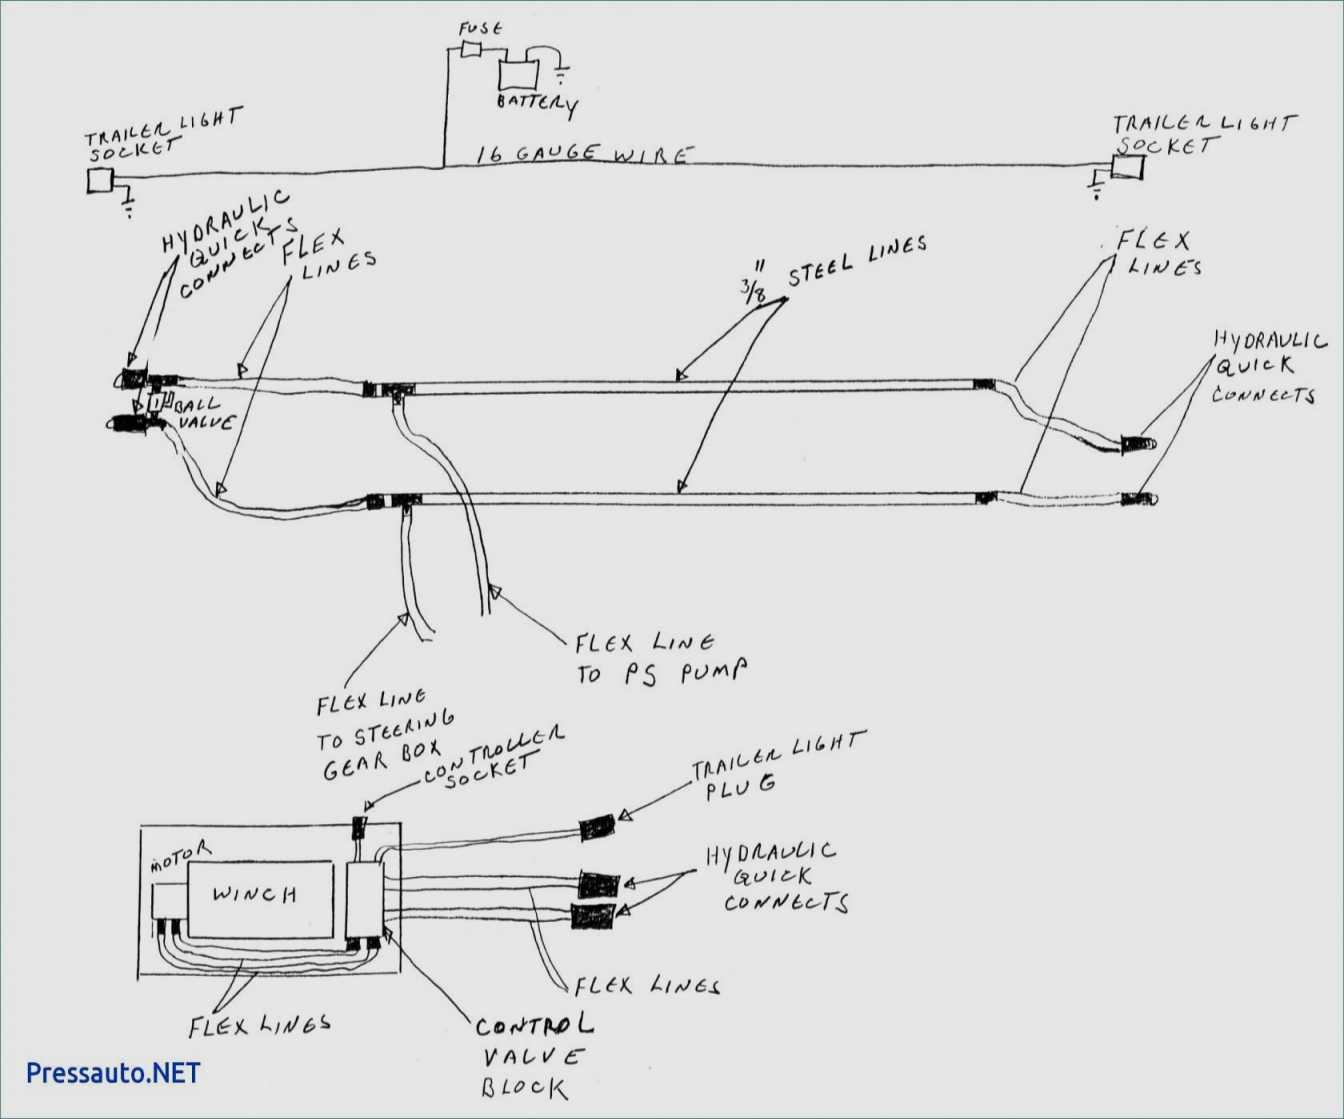 Warn Winch Wiring Diagram 75000 | Manual E-Books - Warn Winch Wiring Diagram